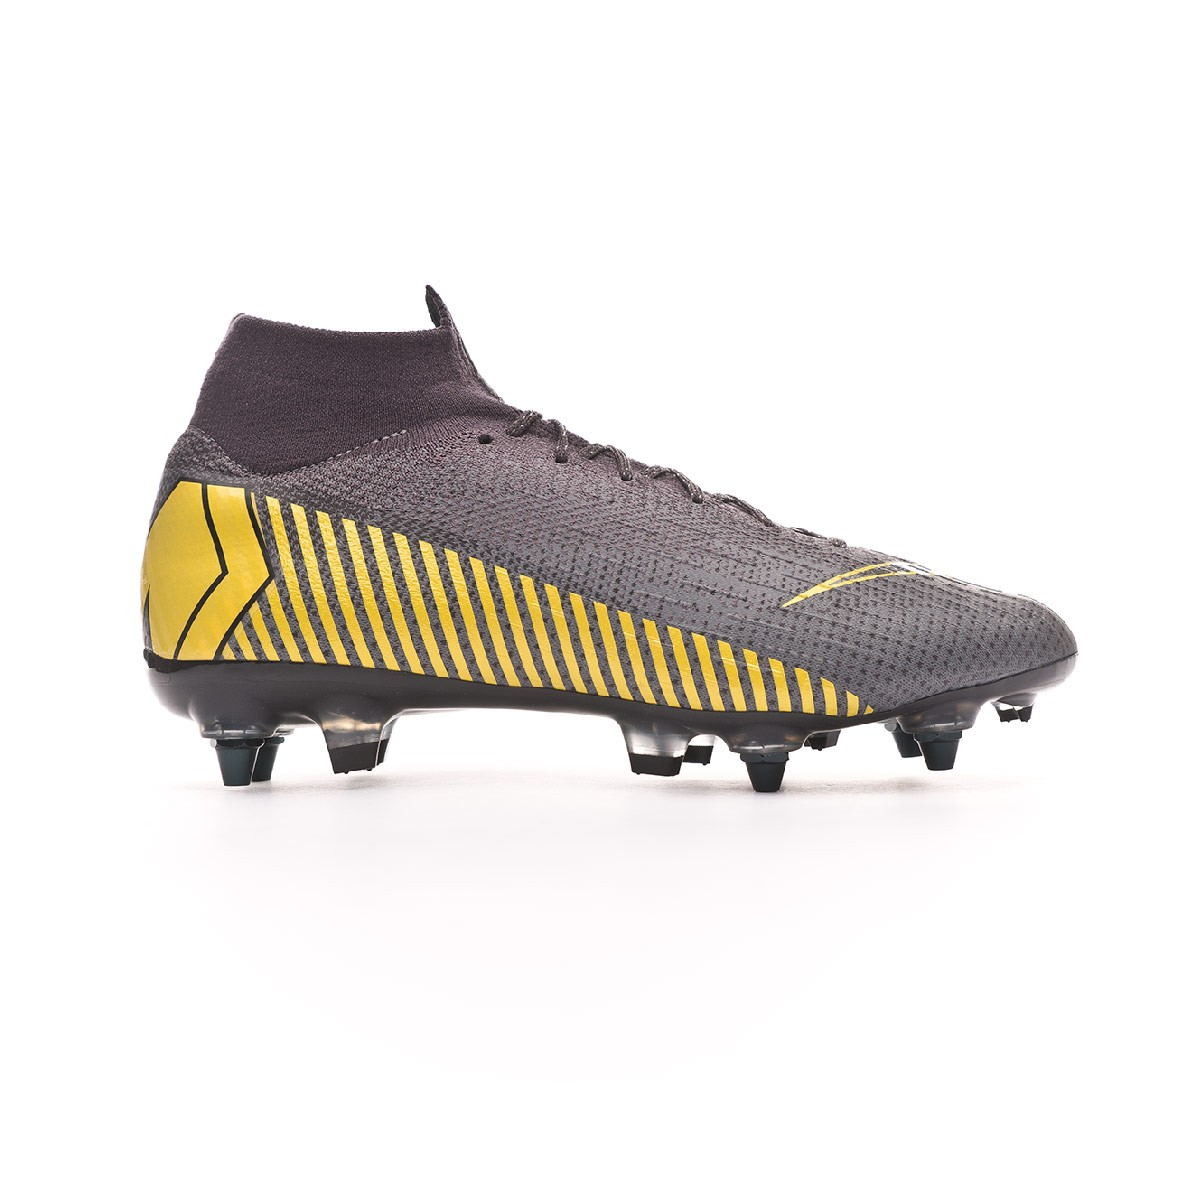 Boot Nike Mercurial Superfly VI Elite Anti-Clog SG-Pro Thunder  grey-Black-Dark grey - Leaked soccer 06158d2be7592